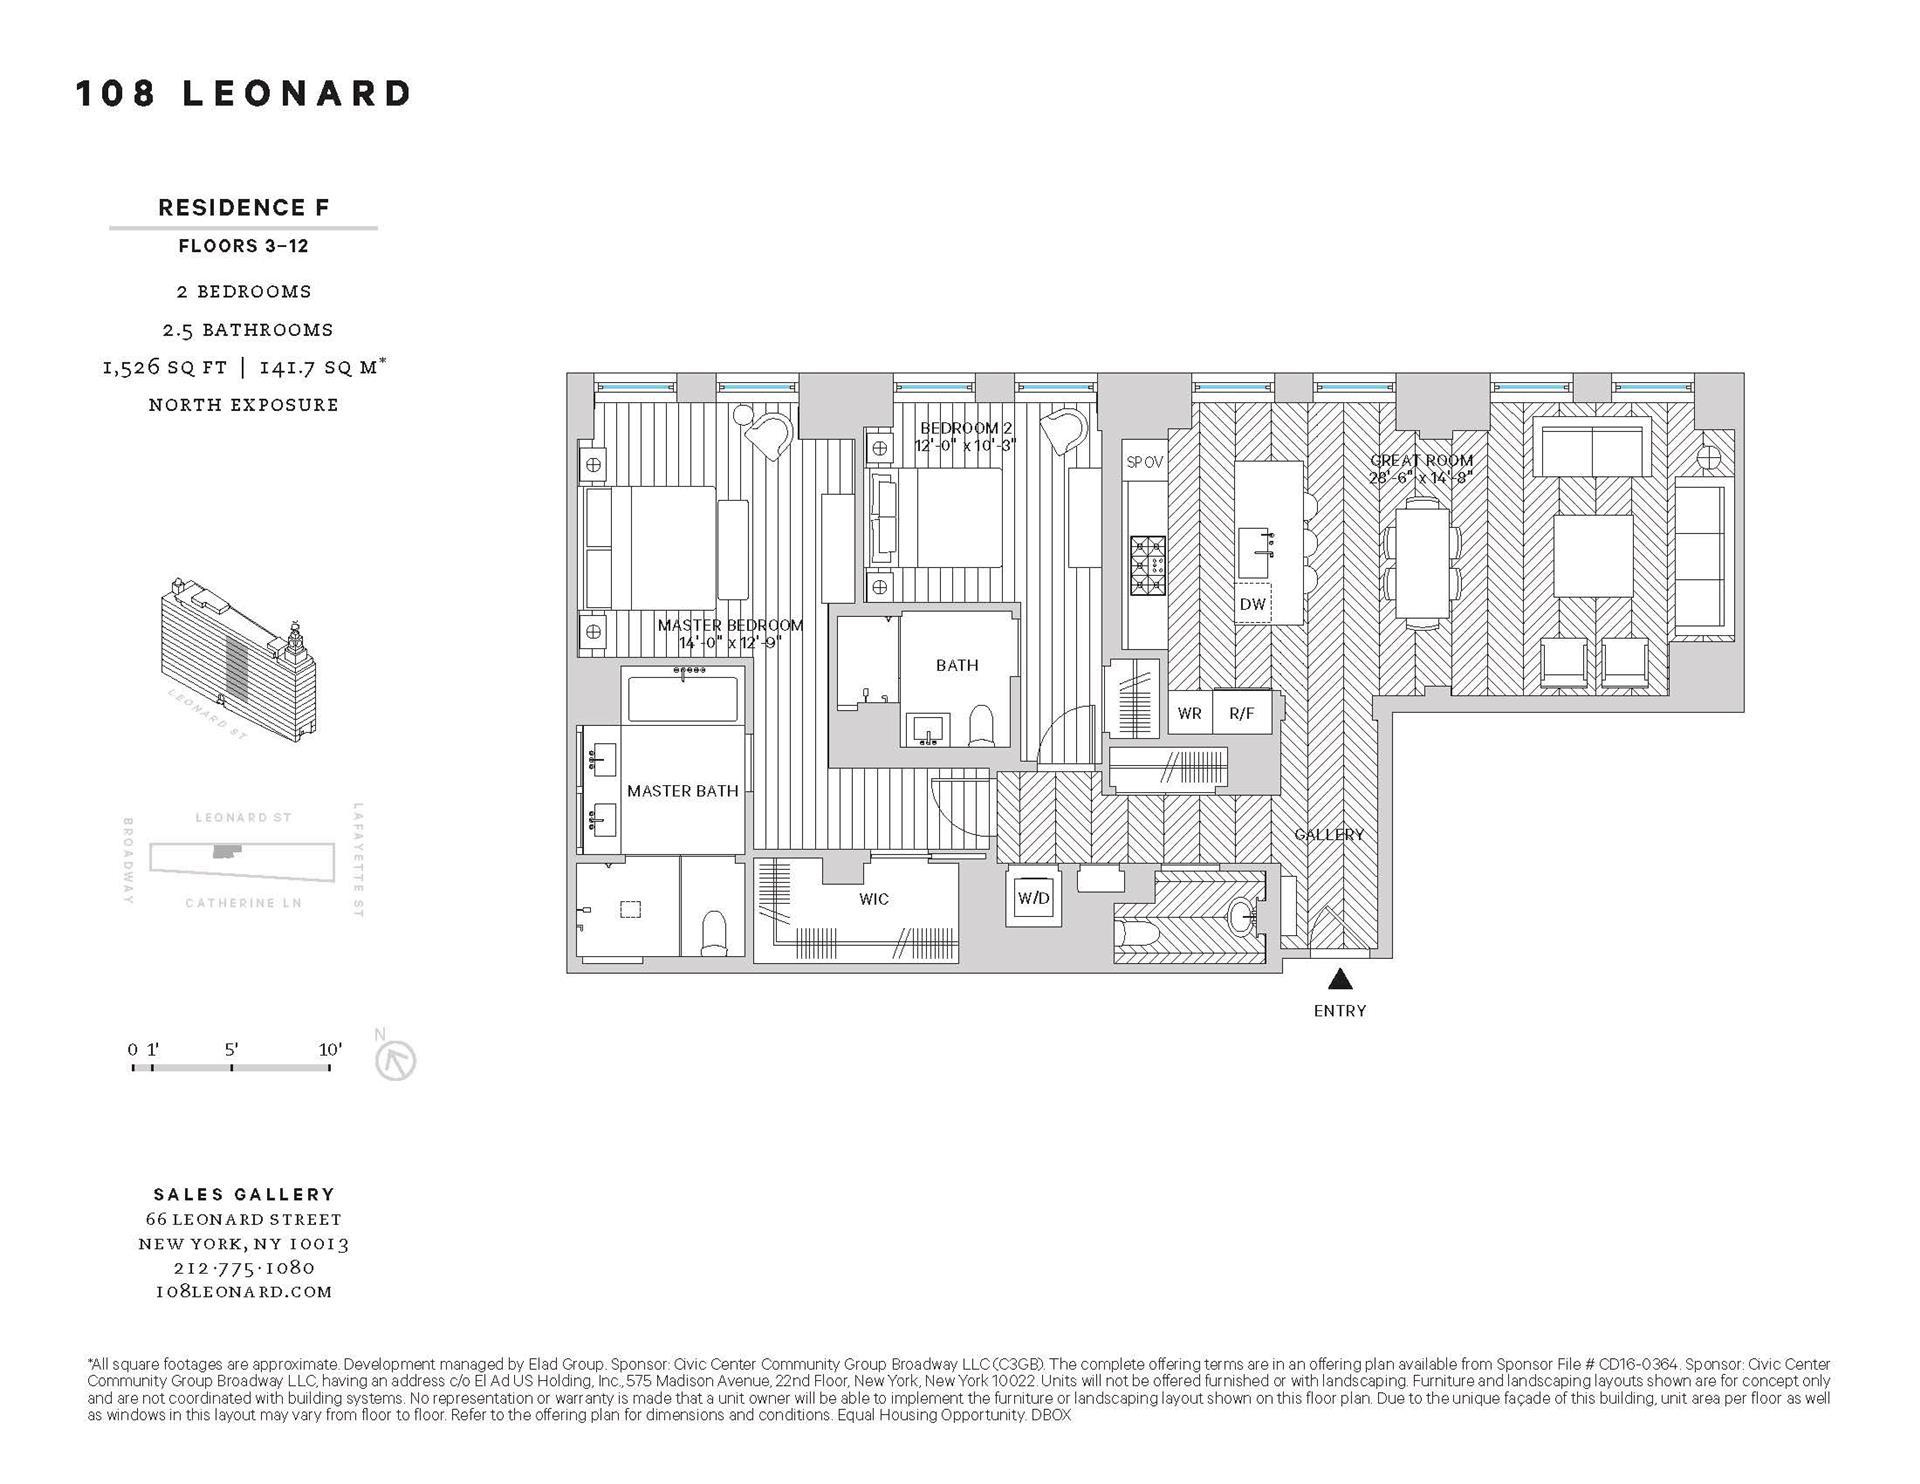 Floor plan of 108 Leonard Street, 9F - TriBeCa, New York